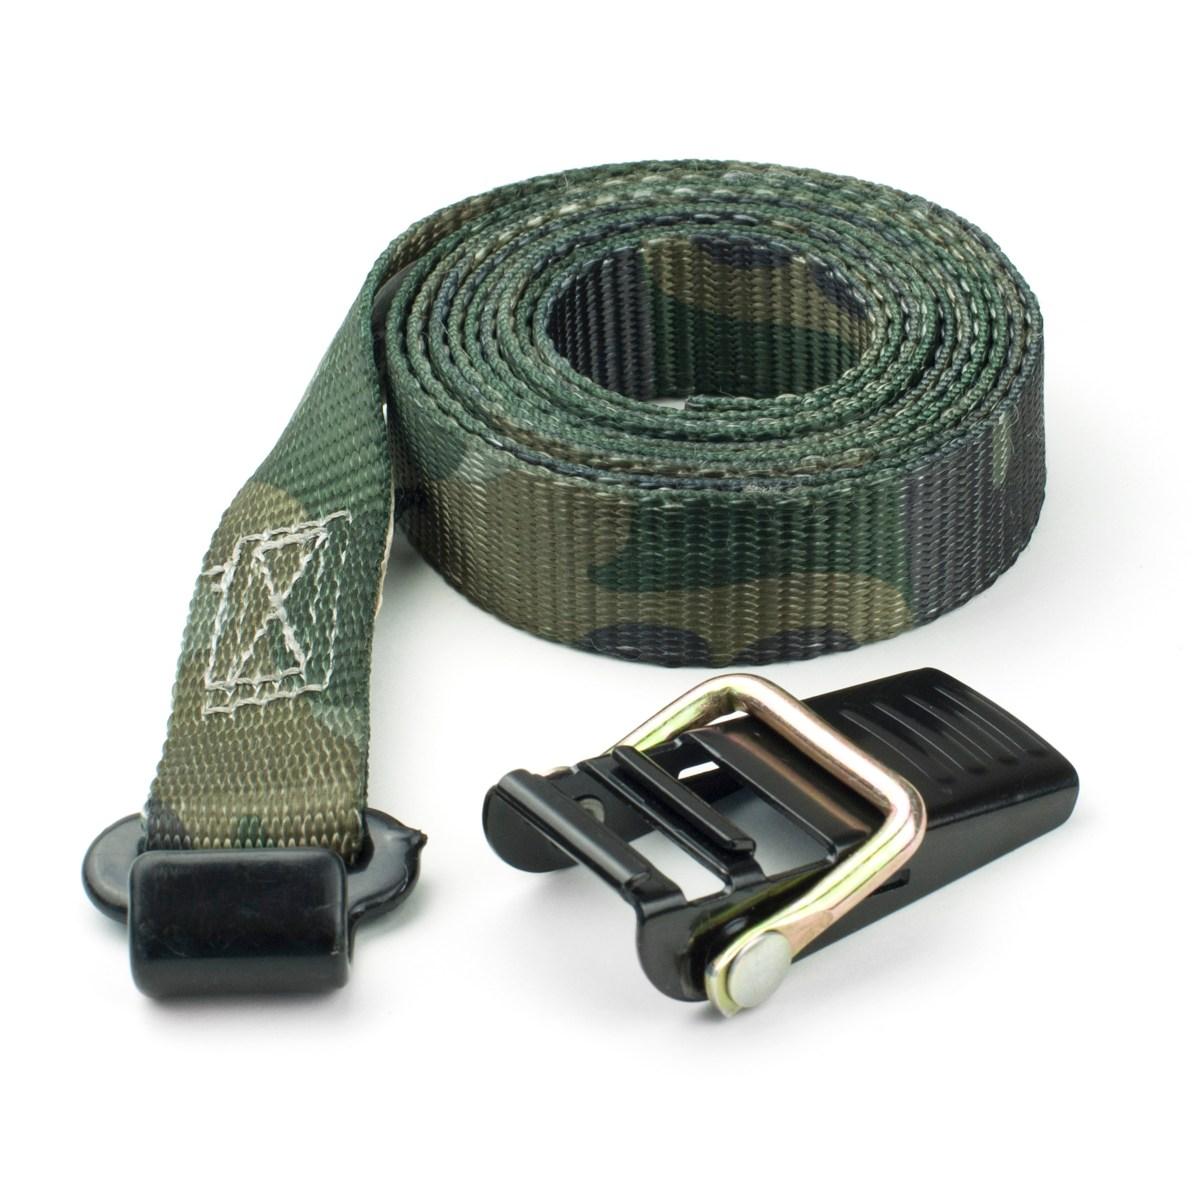 Outdoor Climbing D Ring Buckle Webbing Belt Hook Carabiner New I5P2 Buckle Z5G2